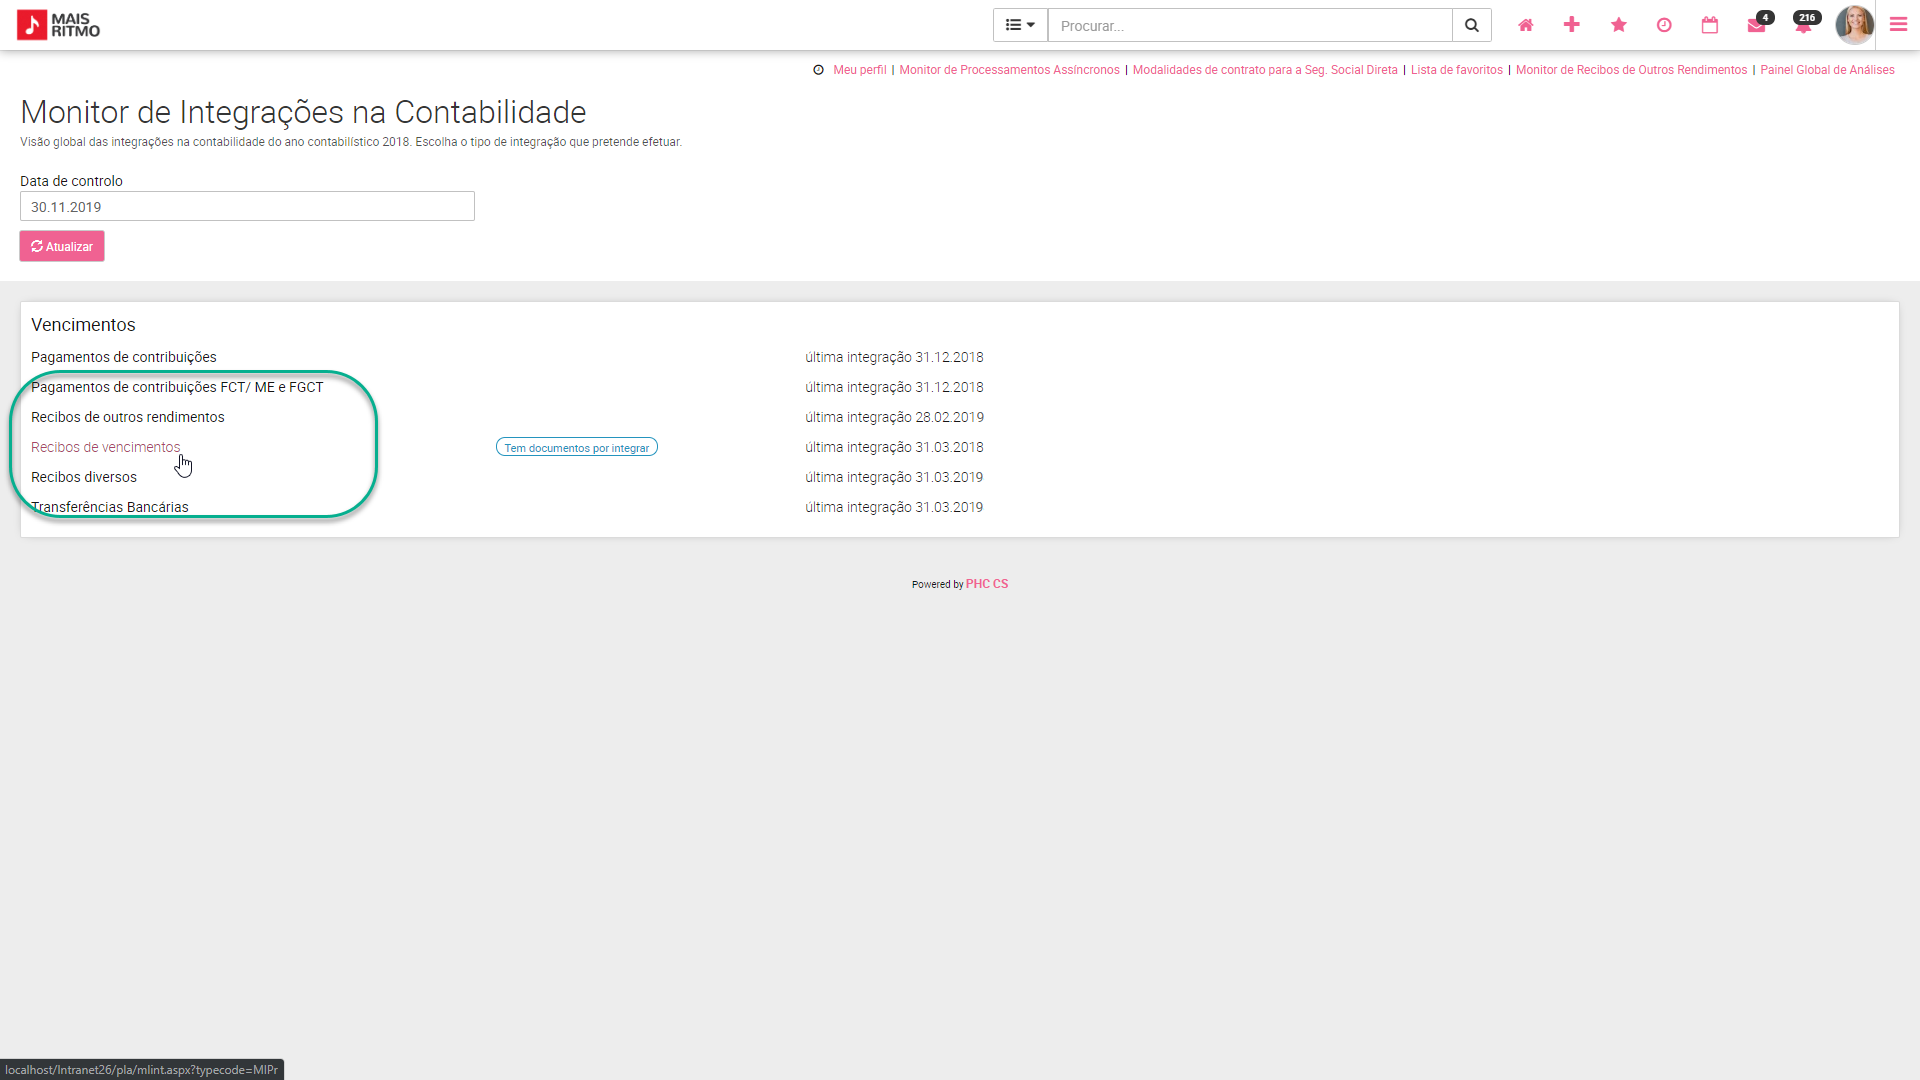 Monitor_Assistente_Integracoes_Contabilidade_vencimentos_web2